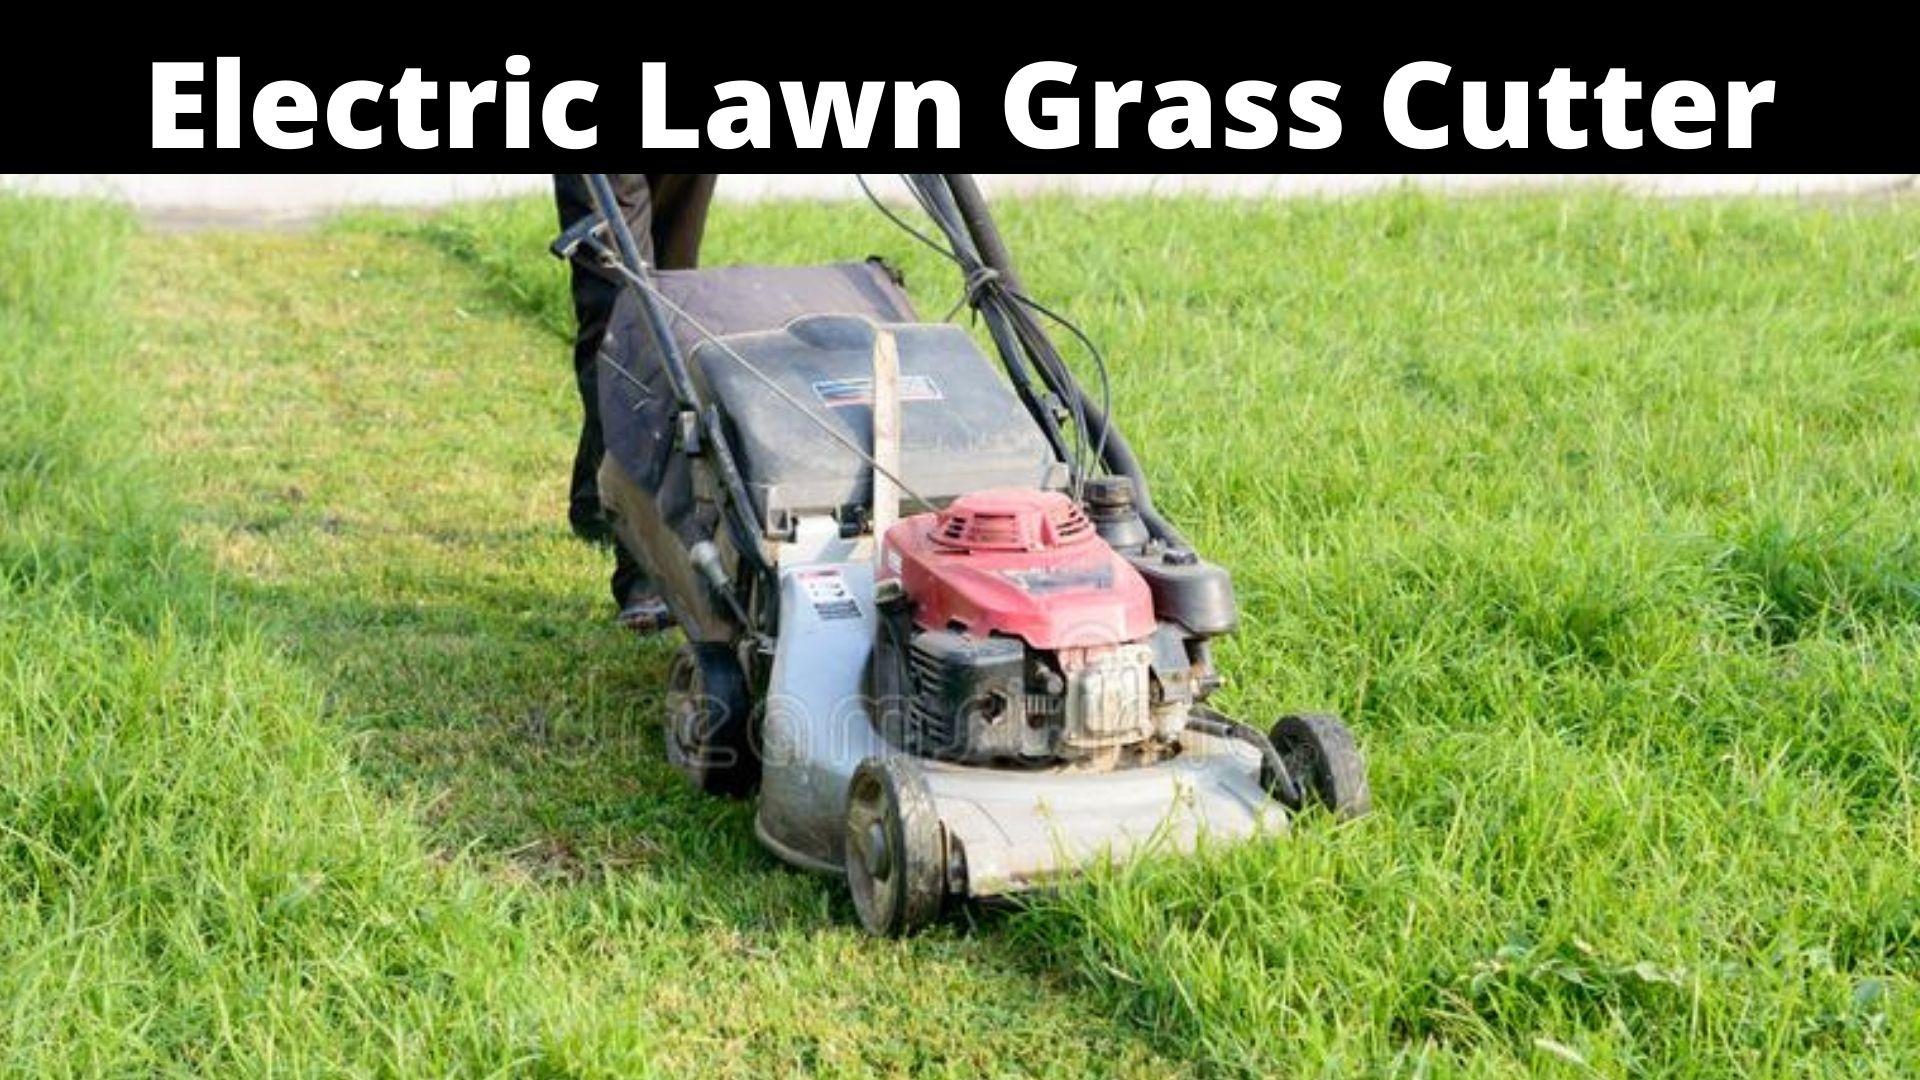 Electric Lawn Grass Cutter